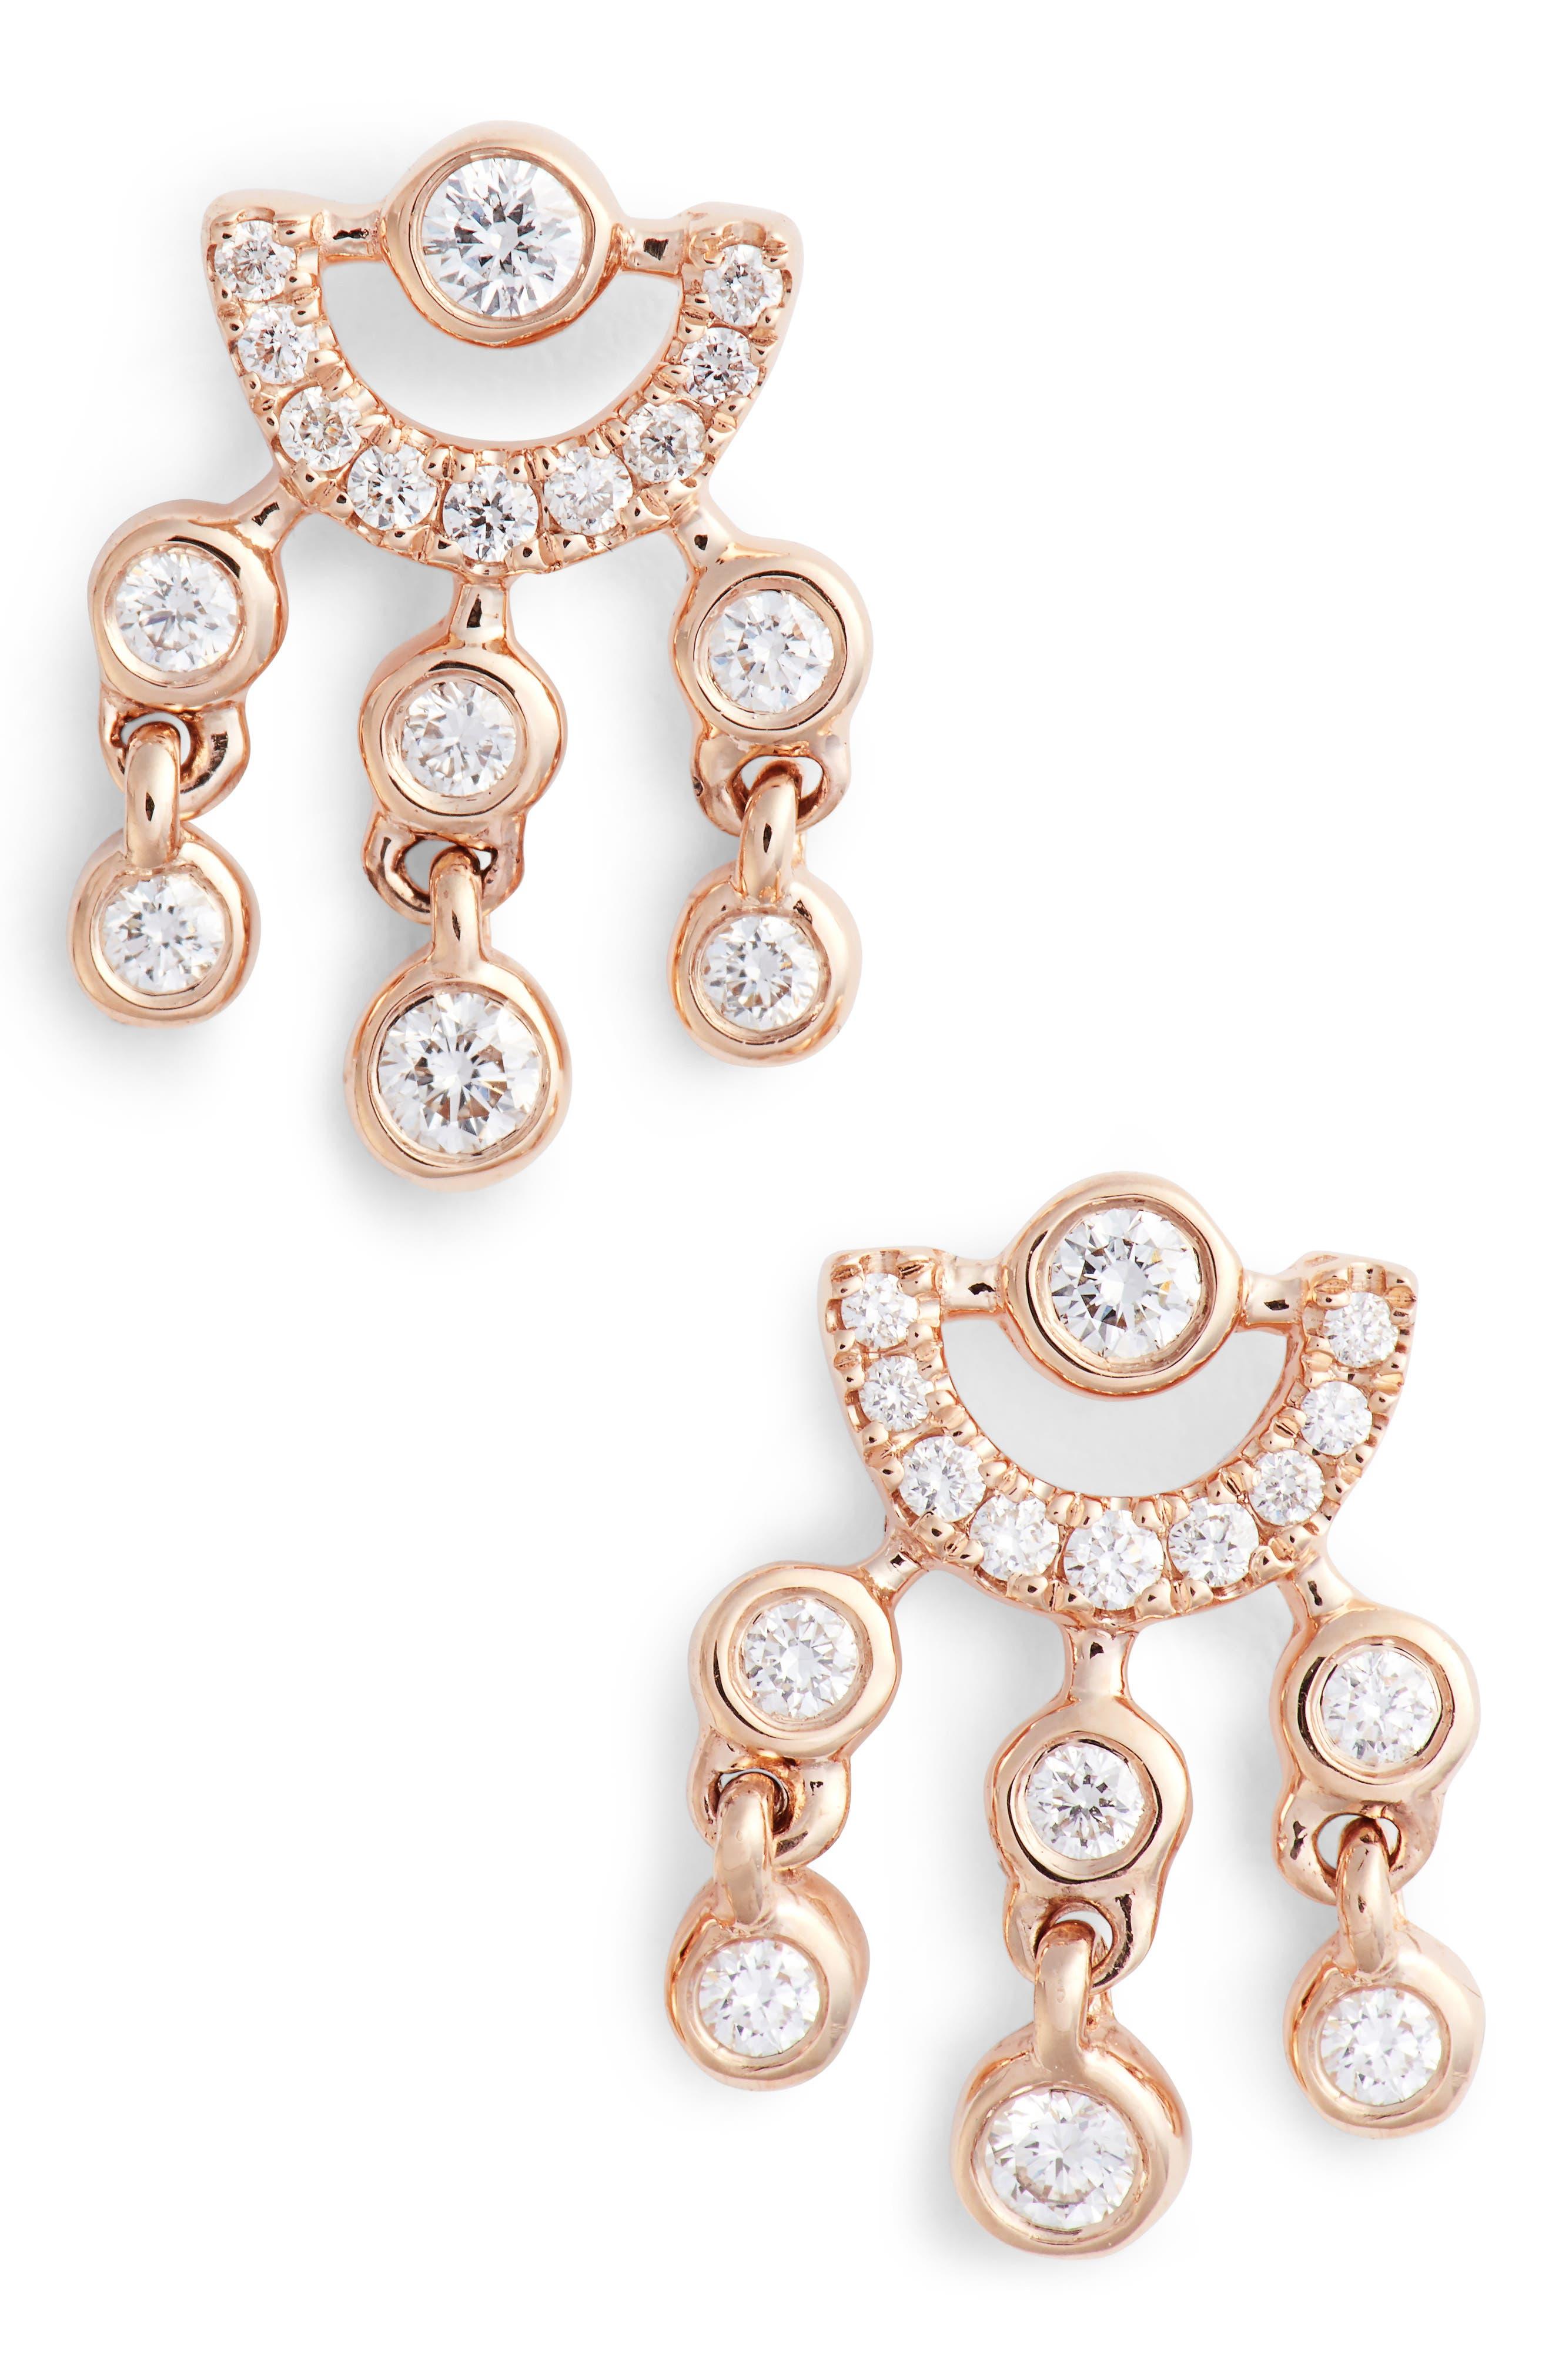 Lulu Jack Diamond Drop Earrings,                         Main,                         color, ROSE GOLD